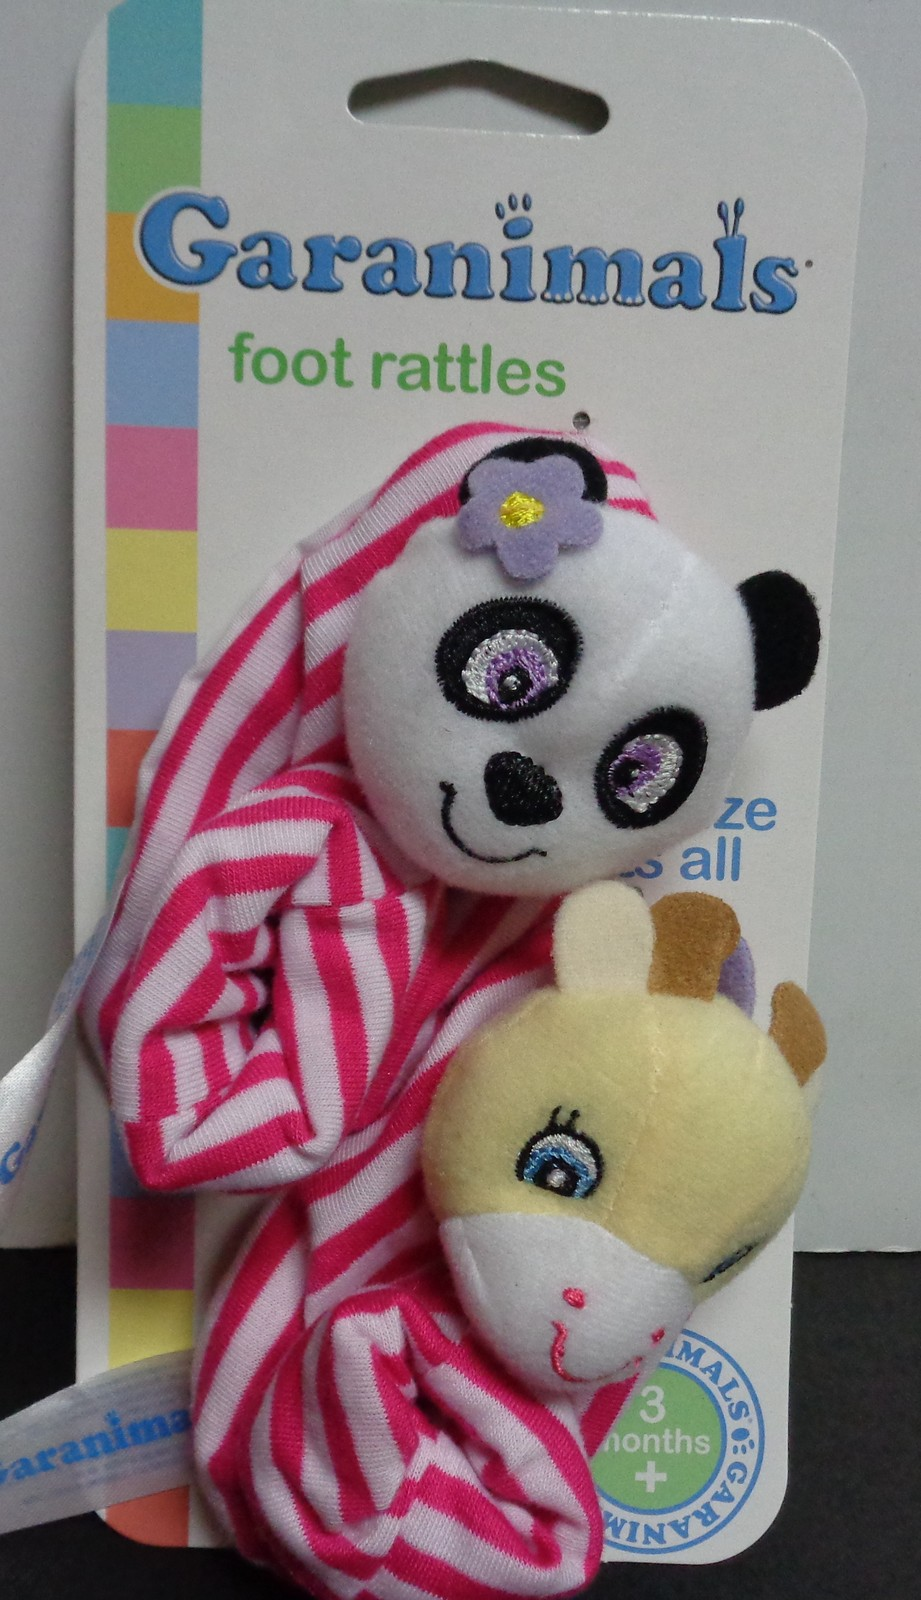 Garanimals Baby Rattle Booties Pink NWT 3 Months +